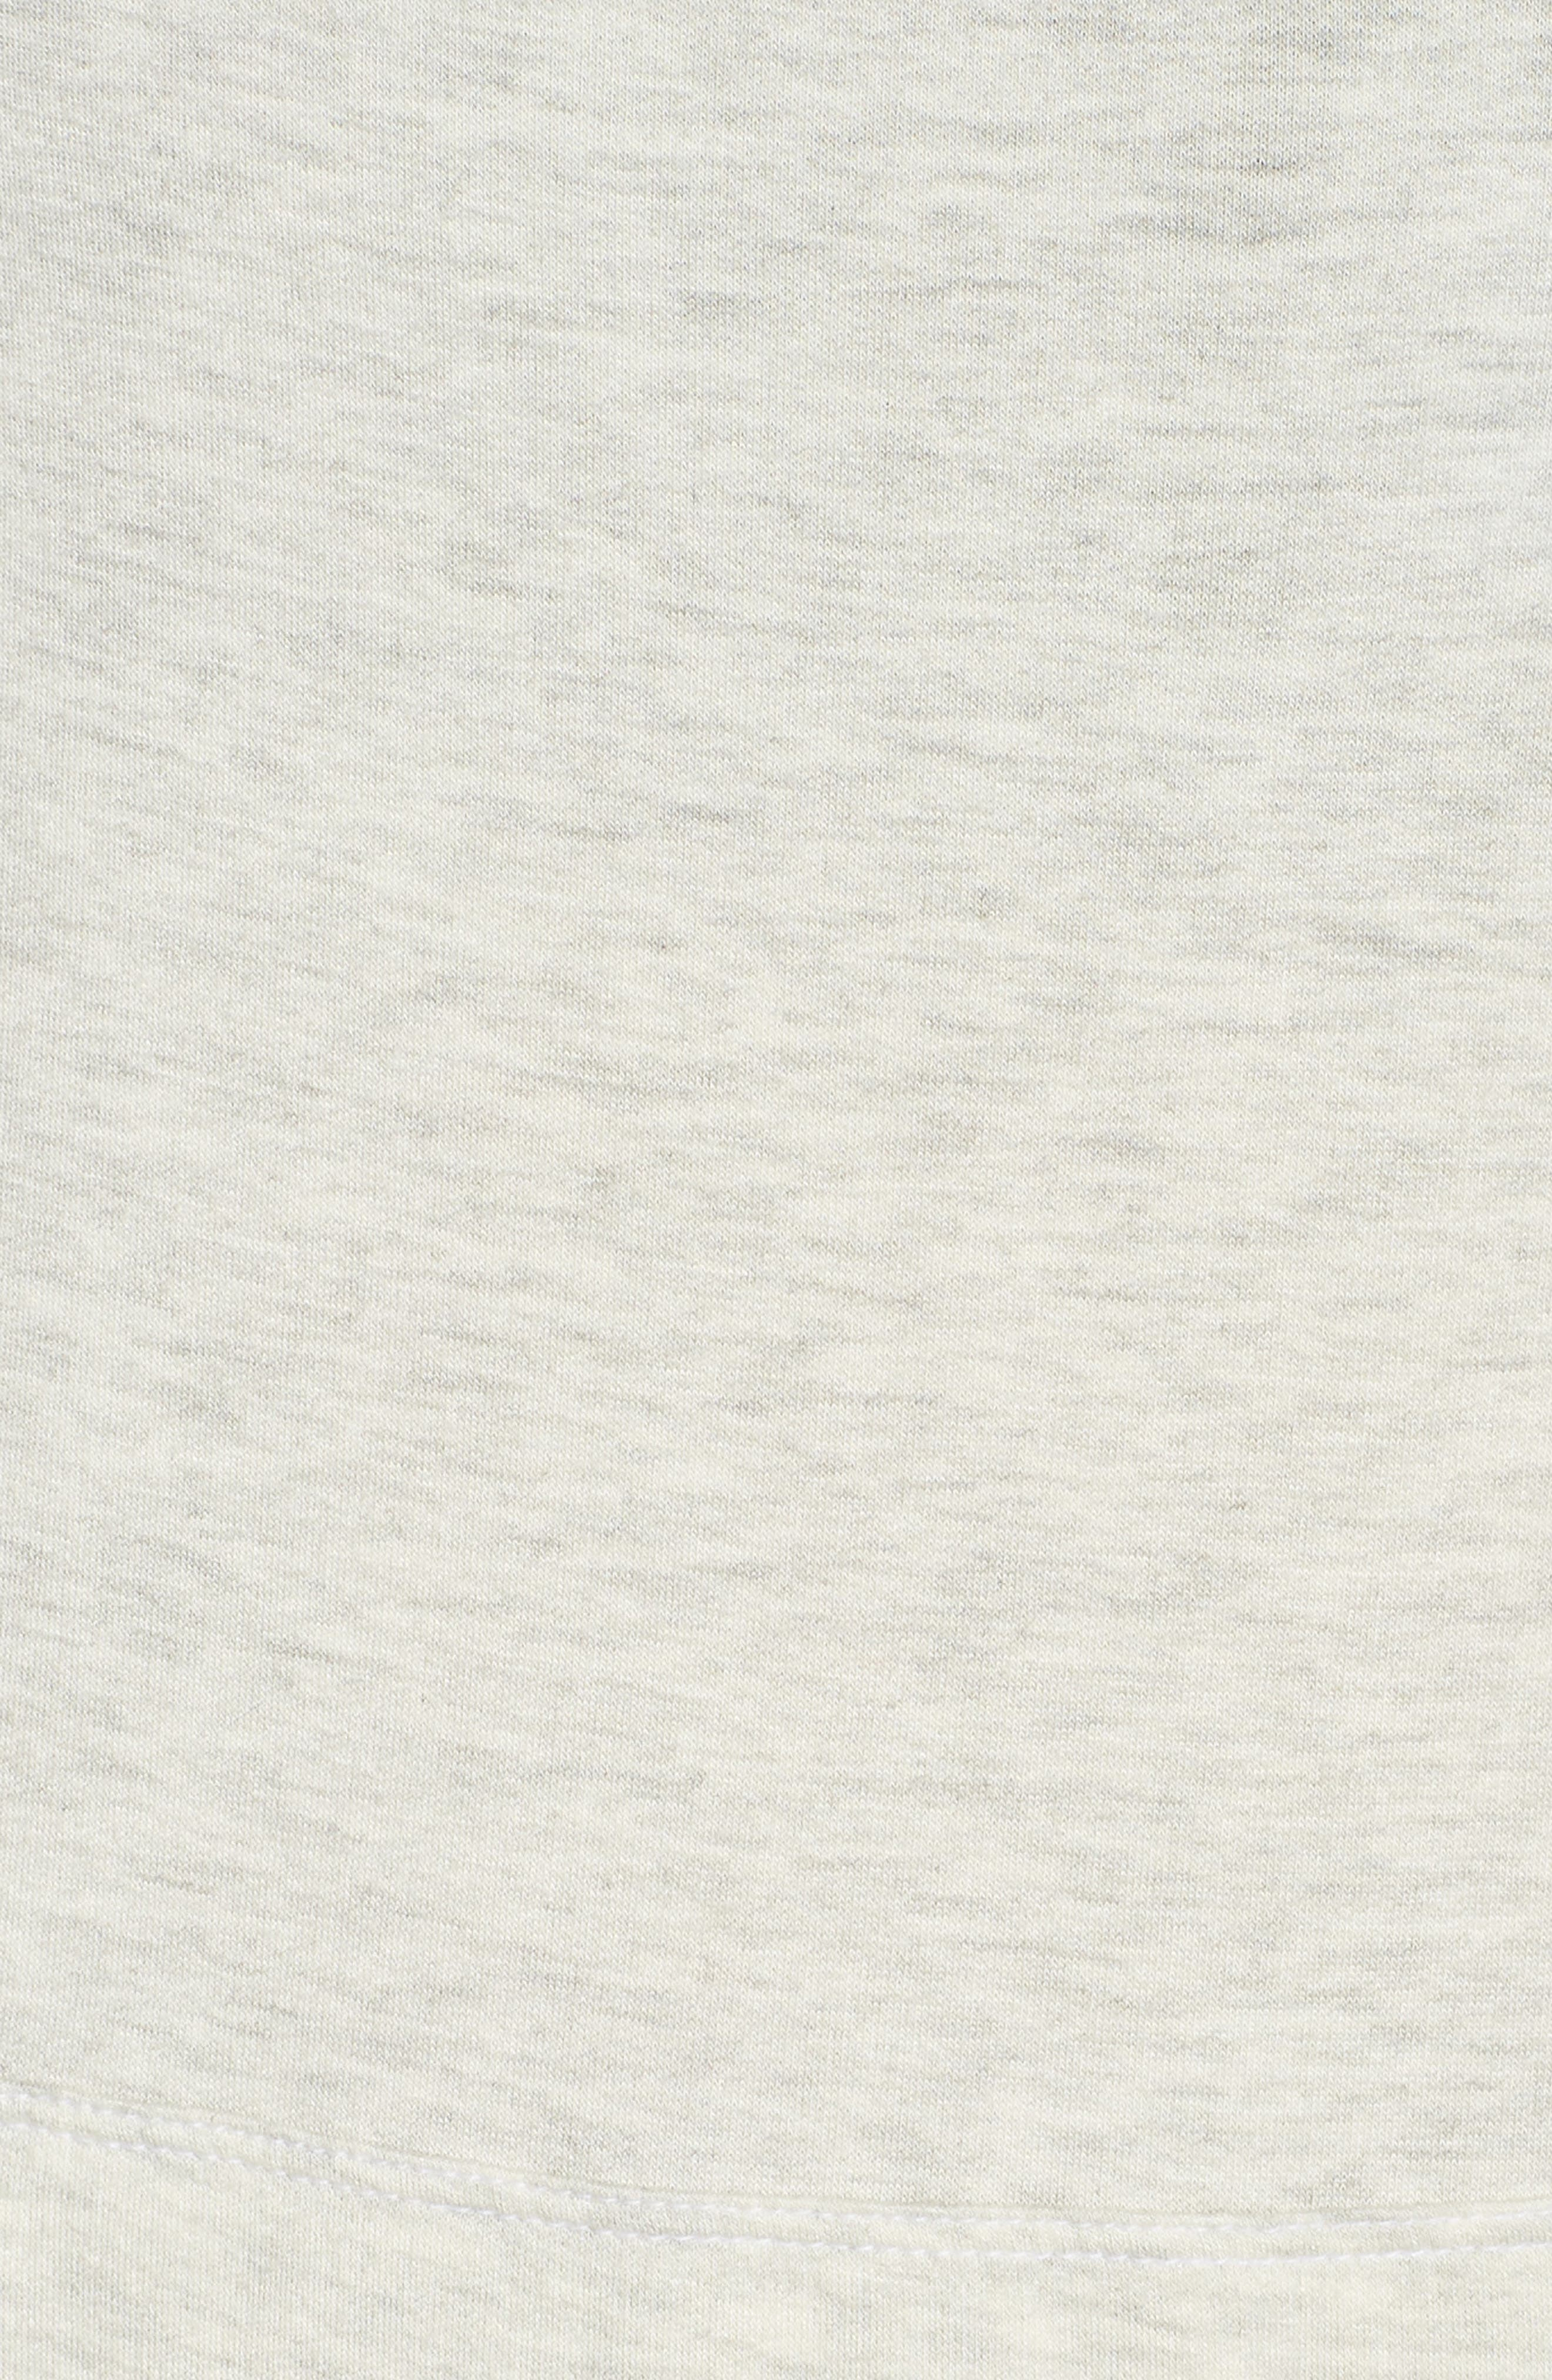 Shira Thankful Cowl Neck Pullover,                             Alternate thumbnail 6, color,                             NATURAL